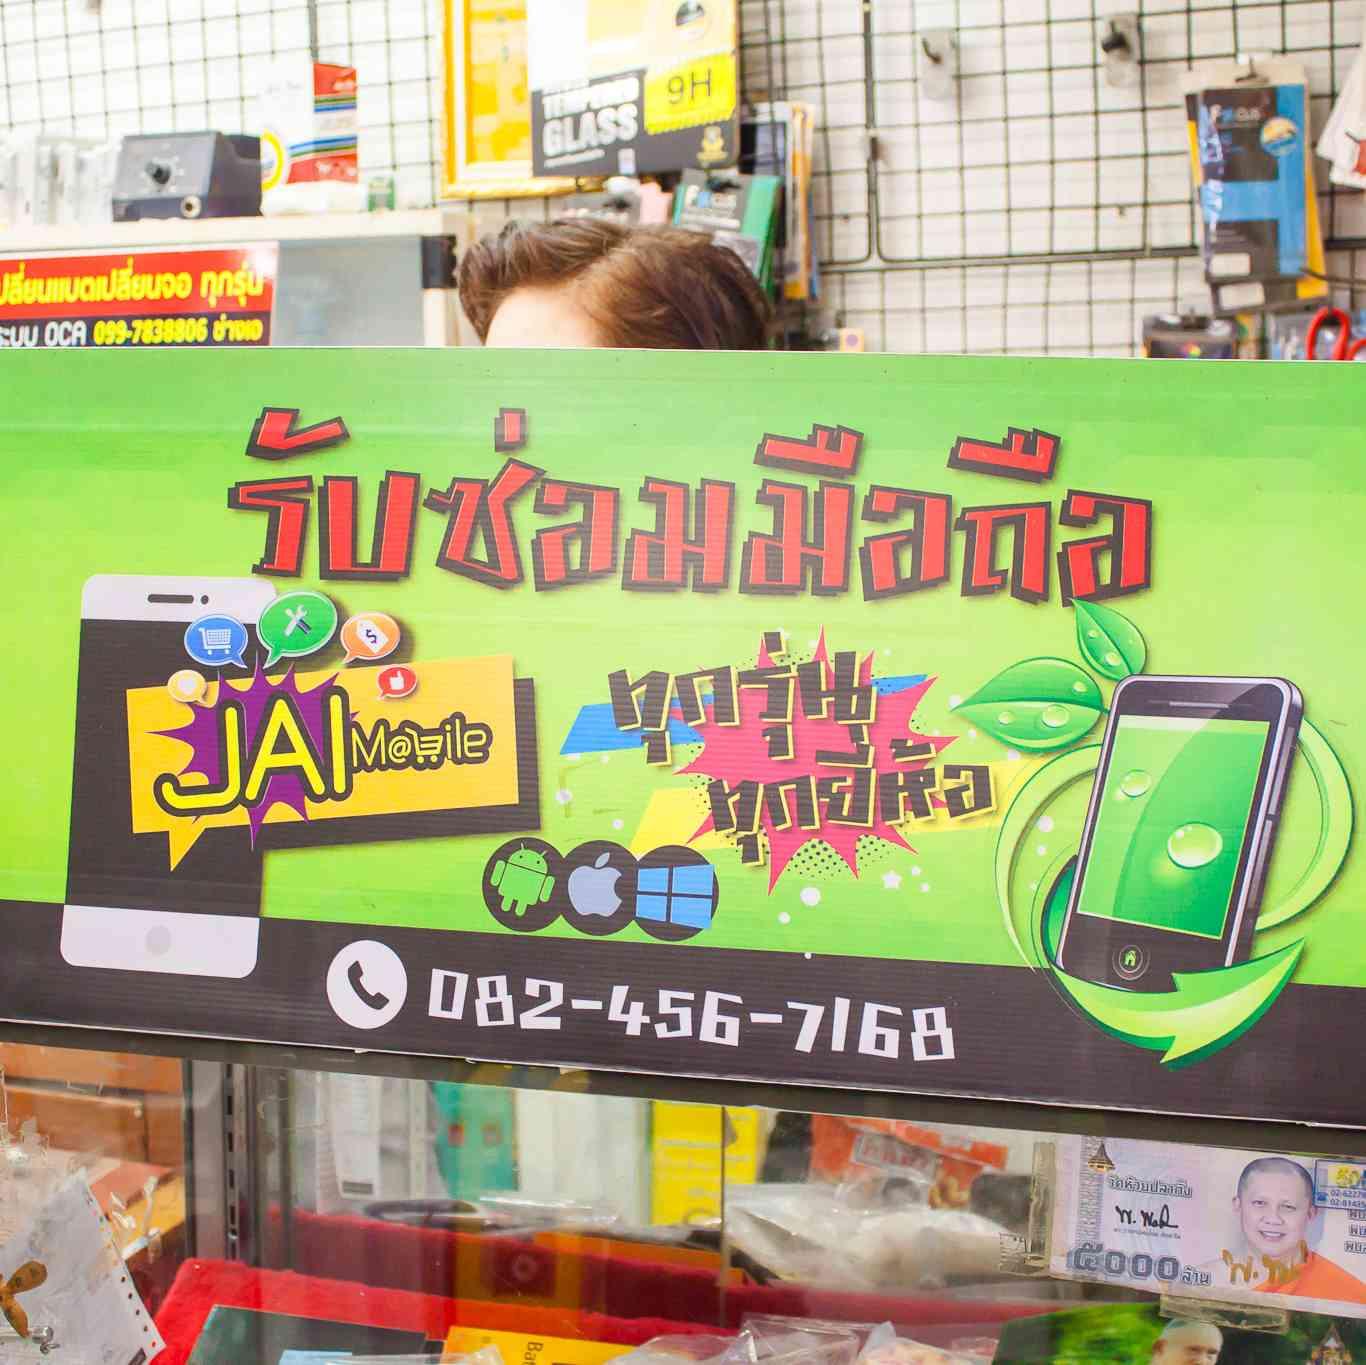 JAI Mobile - แคปปิตอล